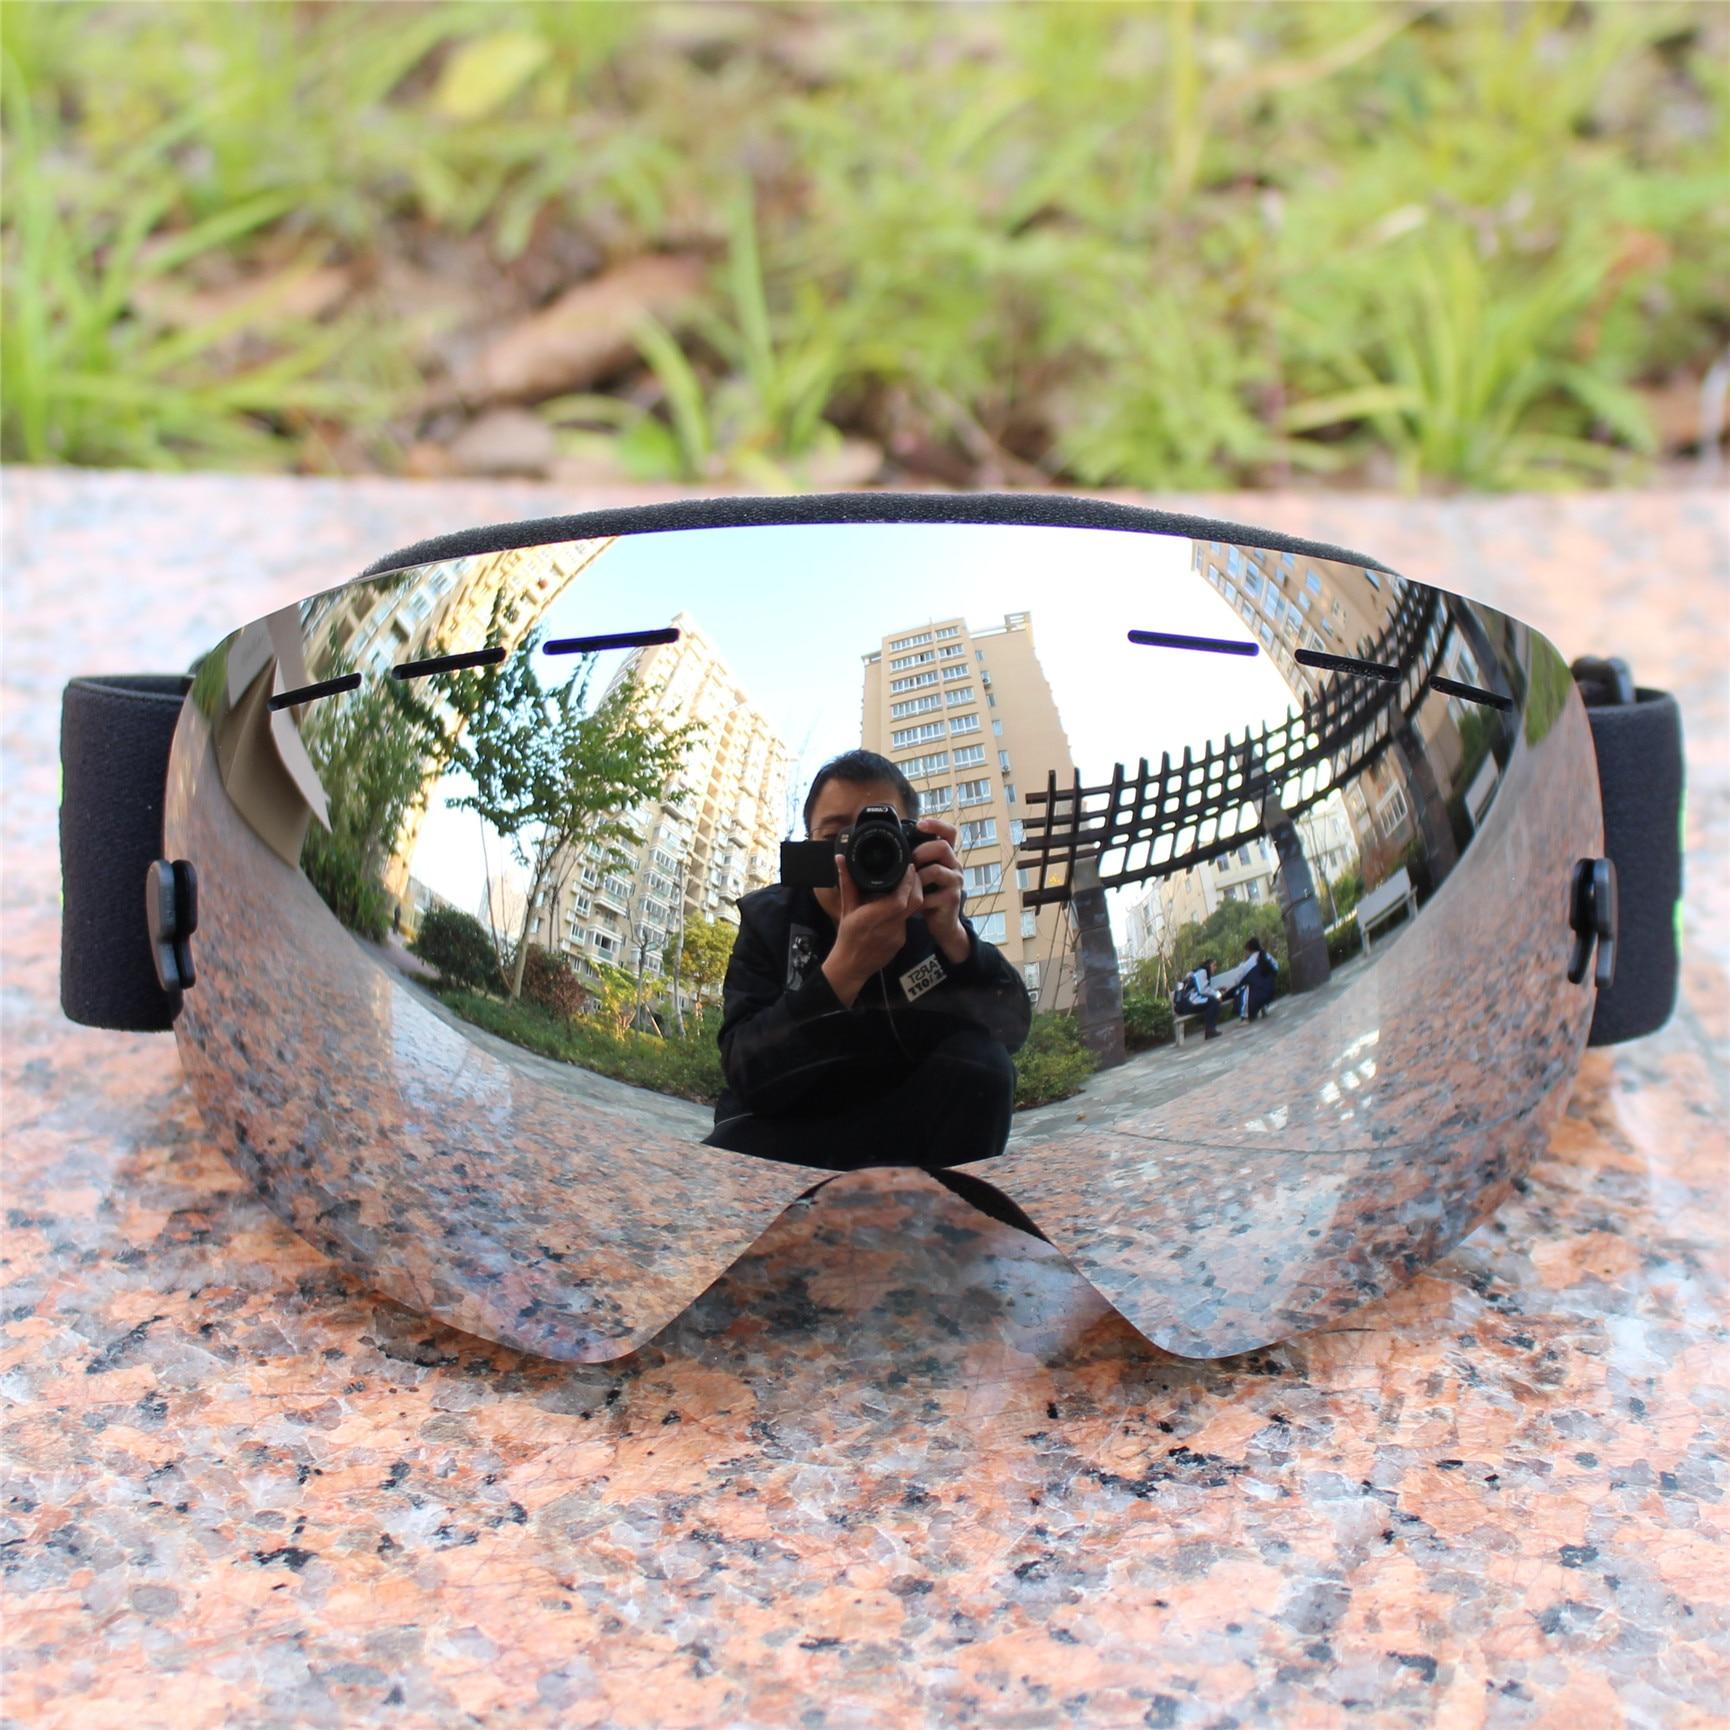 Professional Ski Goggles Layers Lens Adult  Anti-fog UV400 Ski Glasses Skiing Snowboard Men Women Snow Goggles 025 More Colors